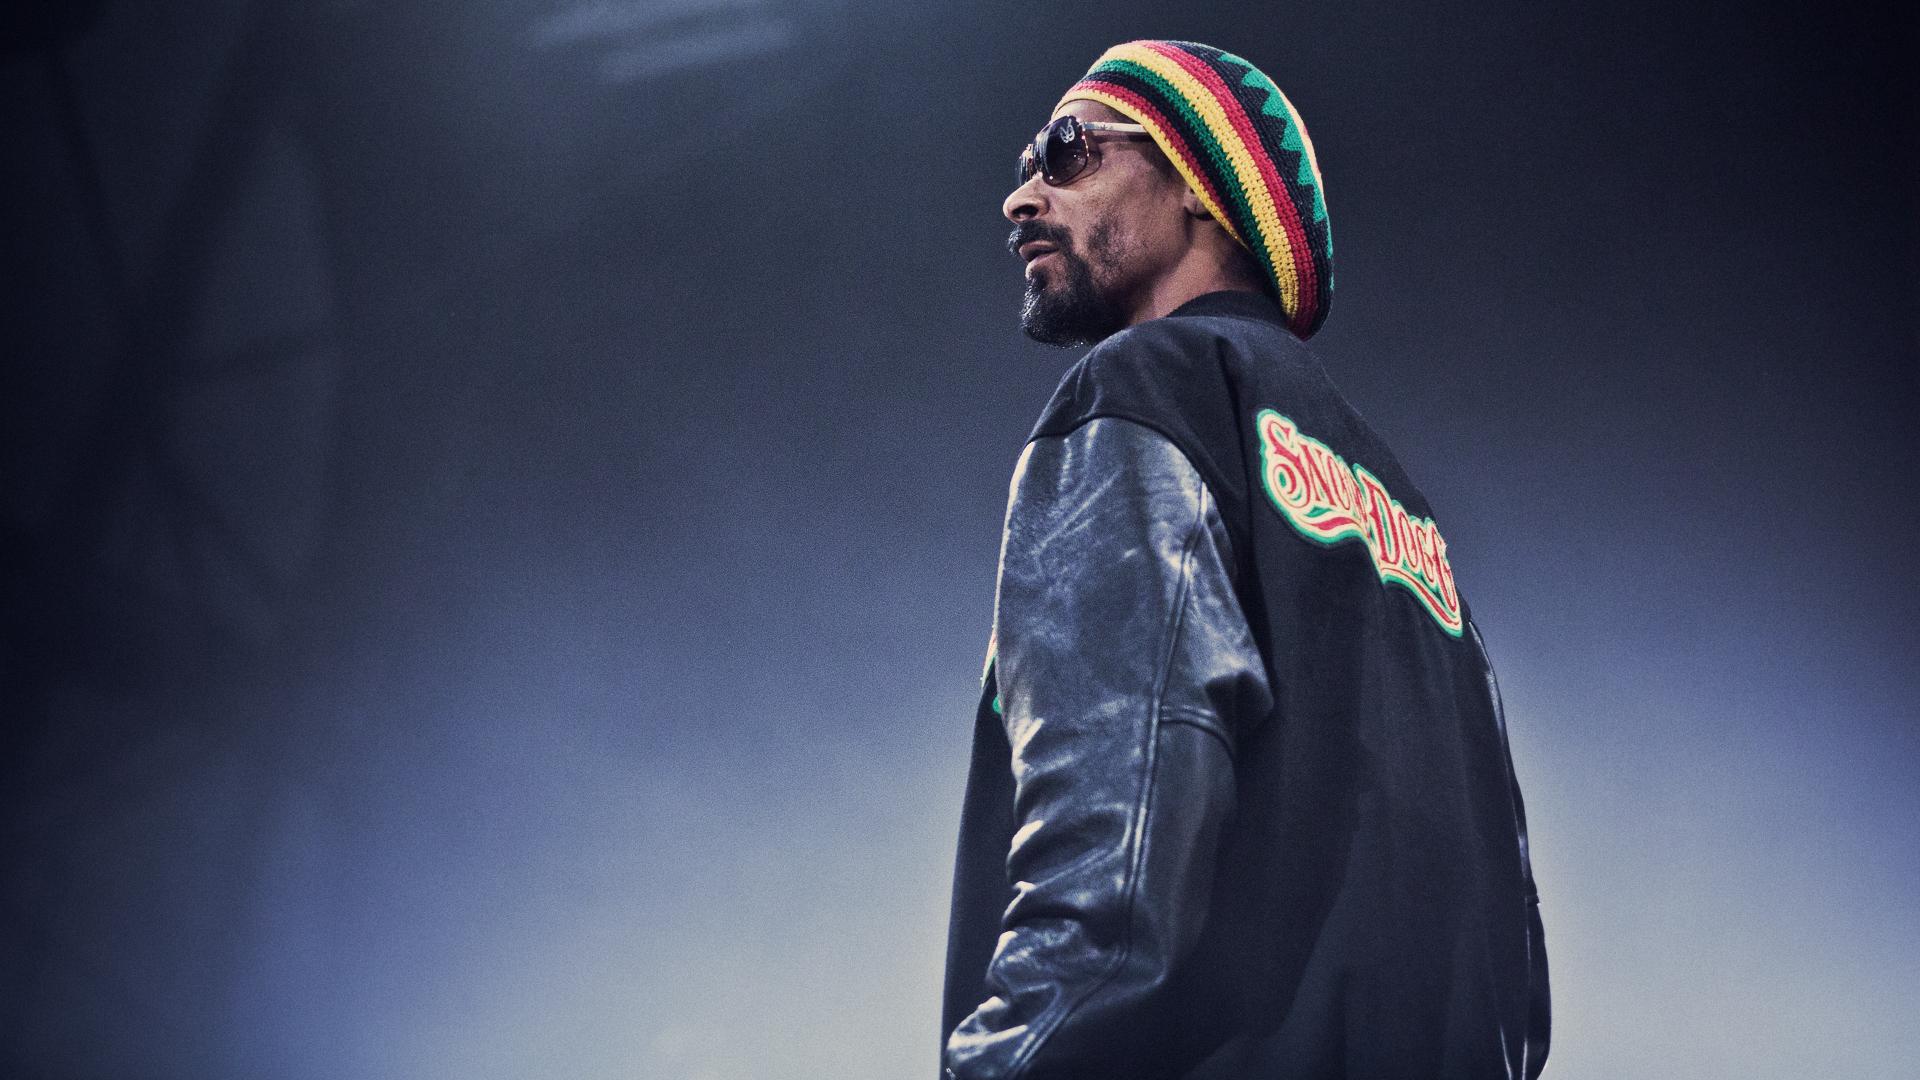 Snoop Dogg @ Hove